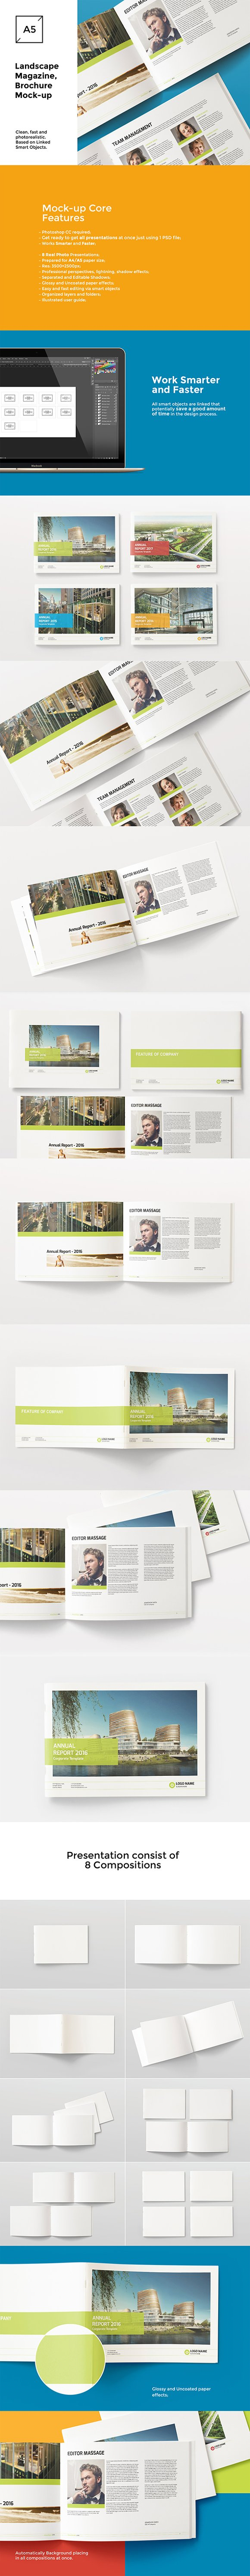 Download A5 / A4 Landscape Catalog Mockups